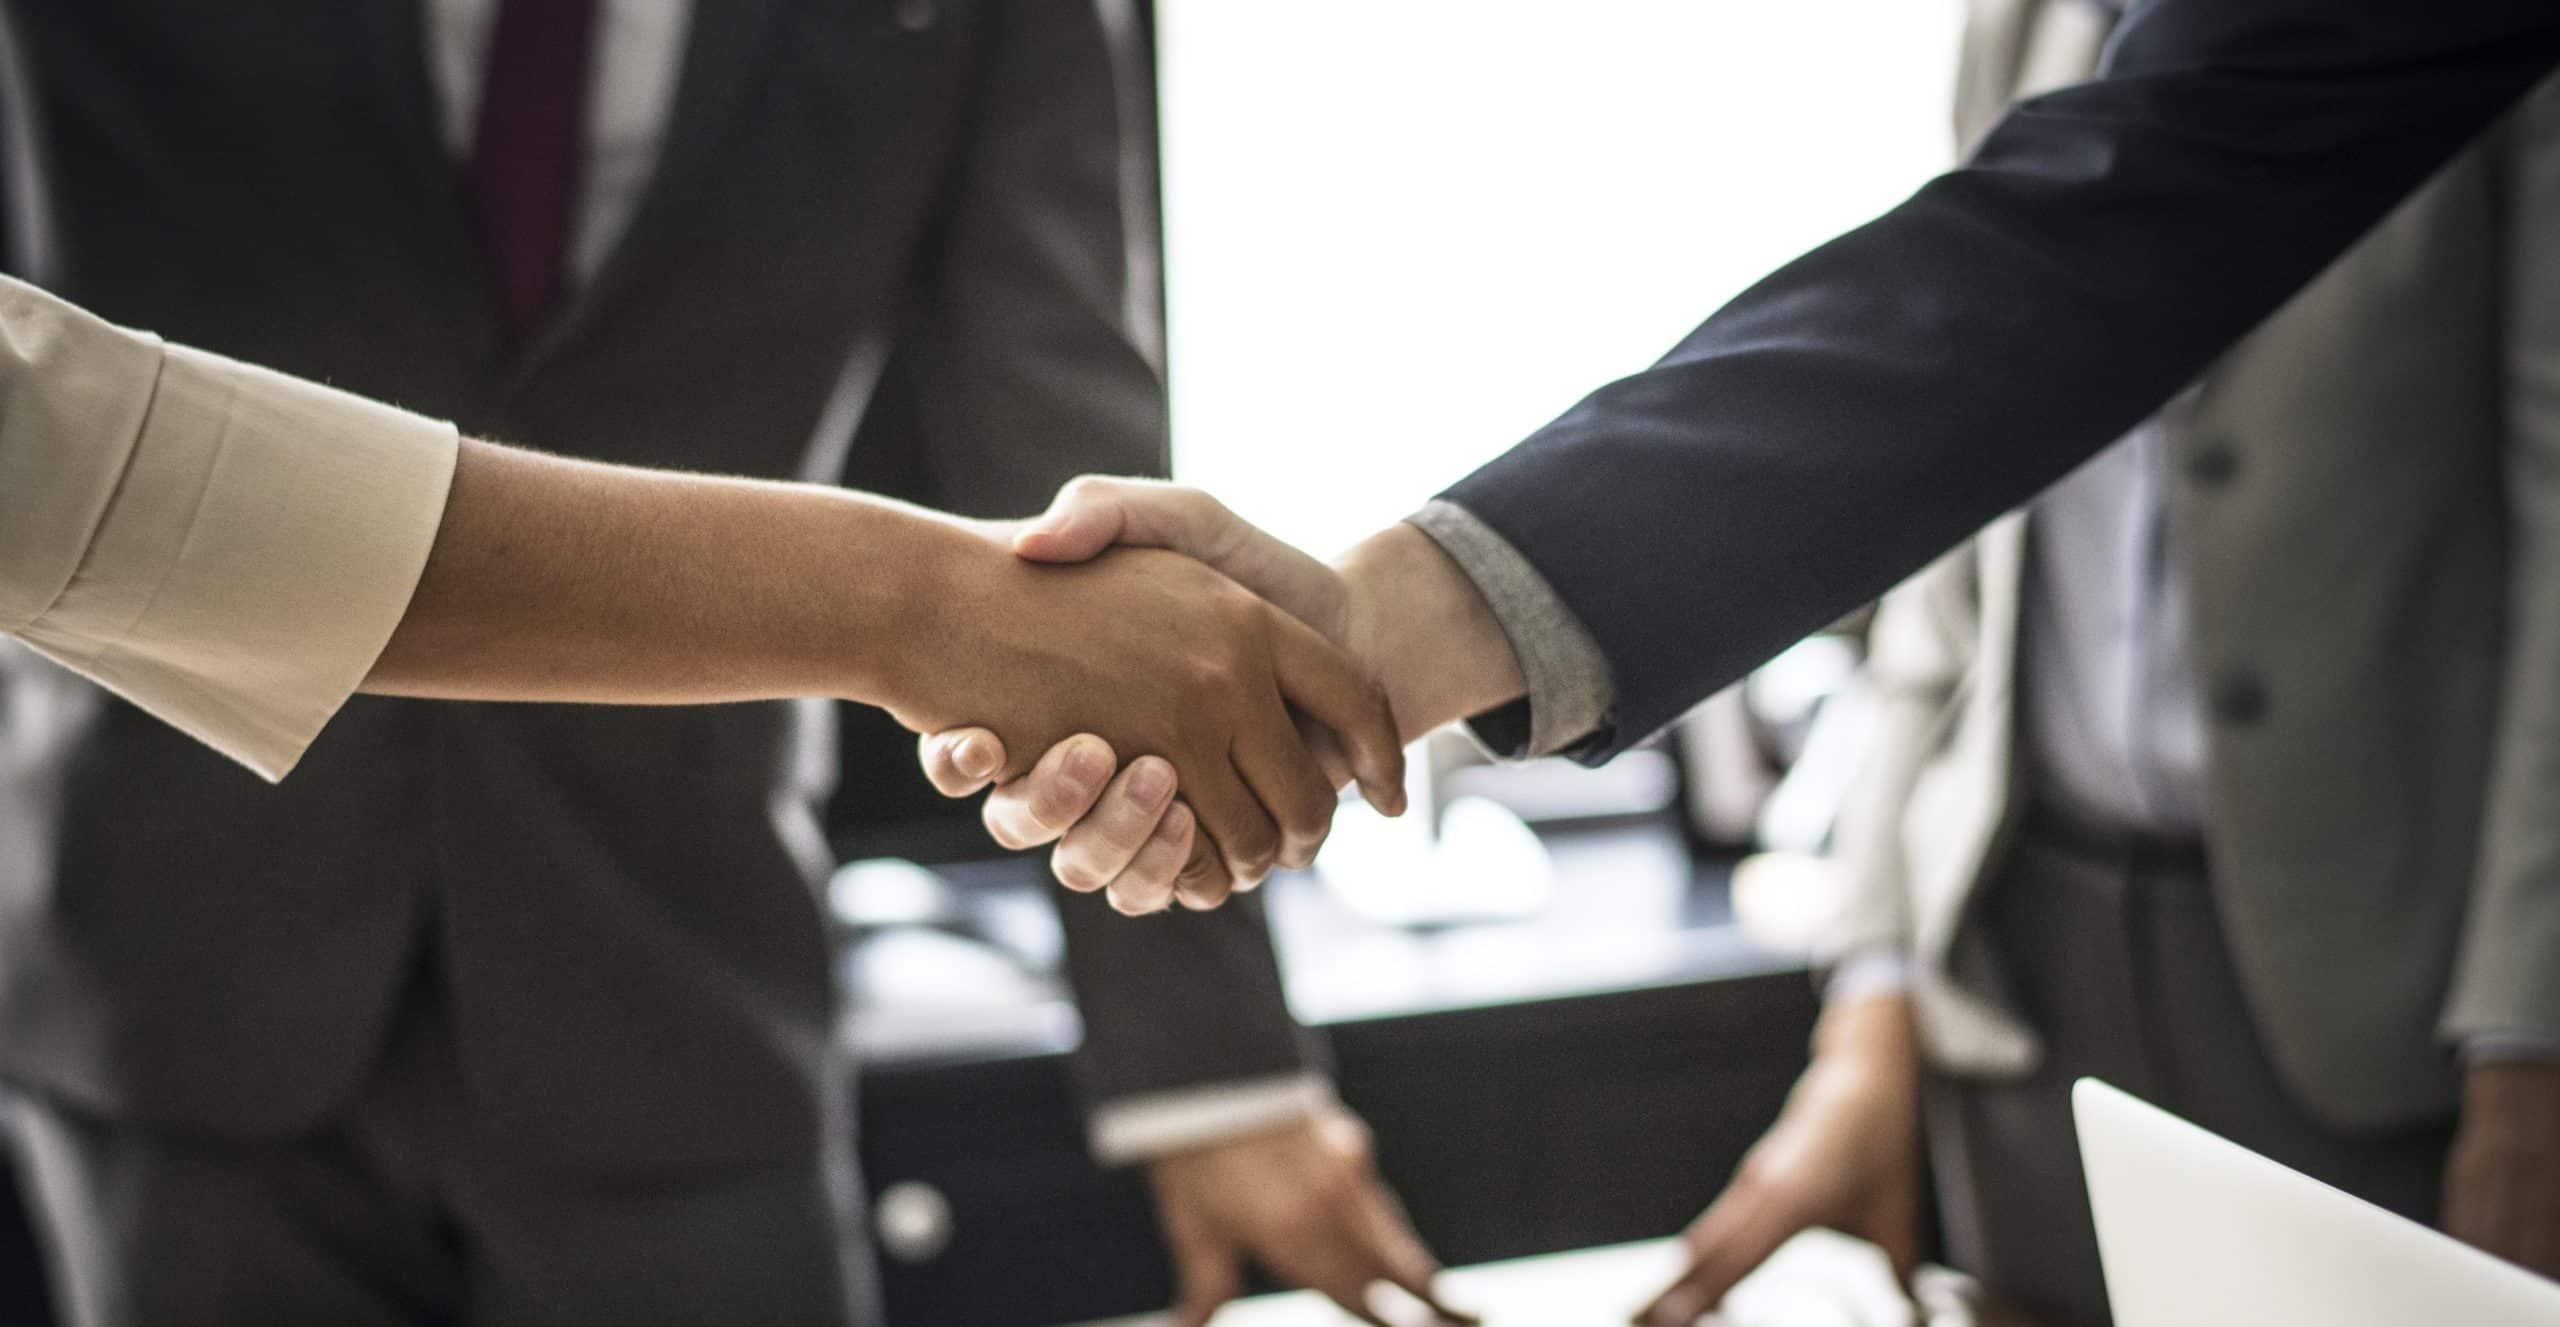 deal shaking hands